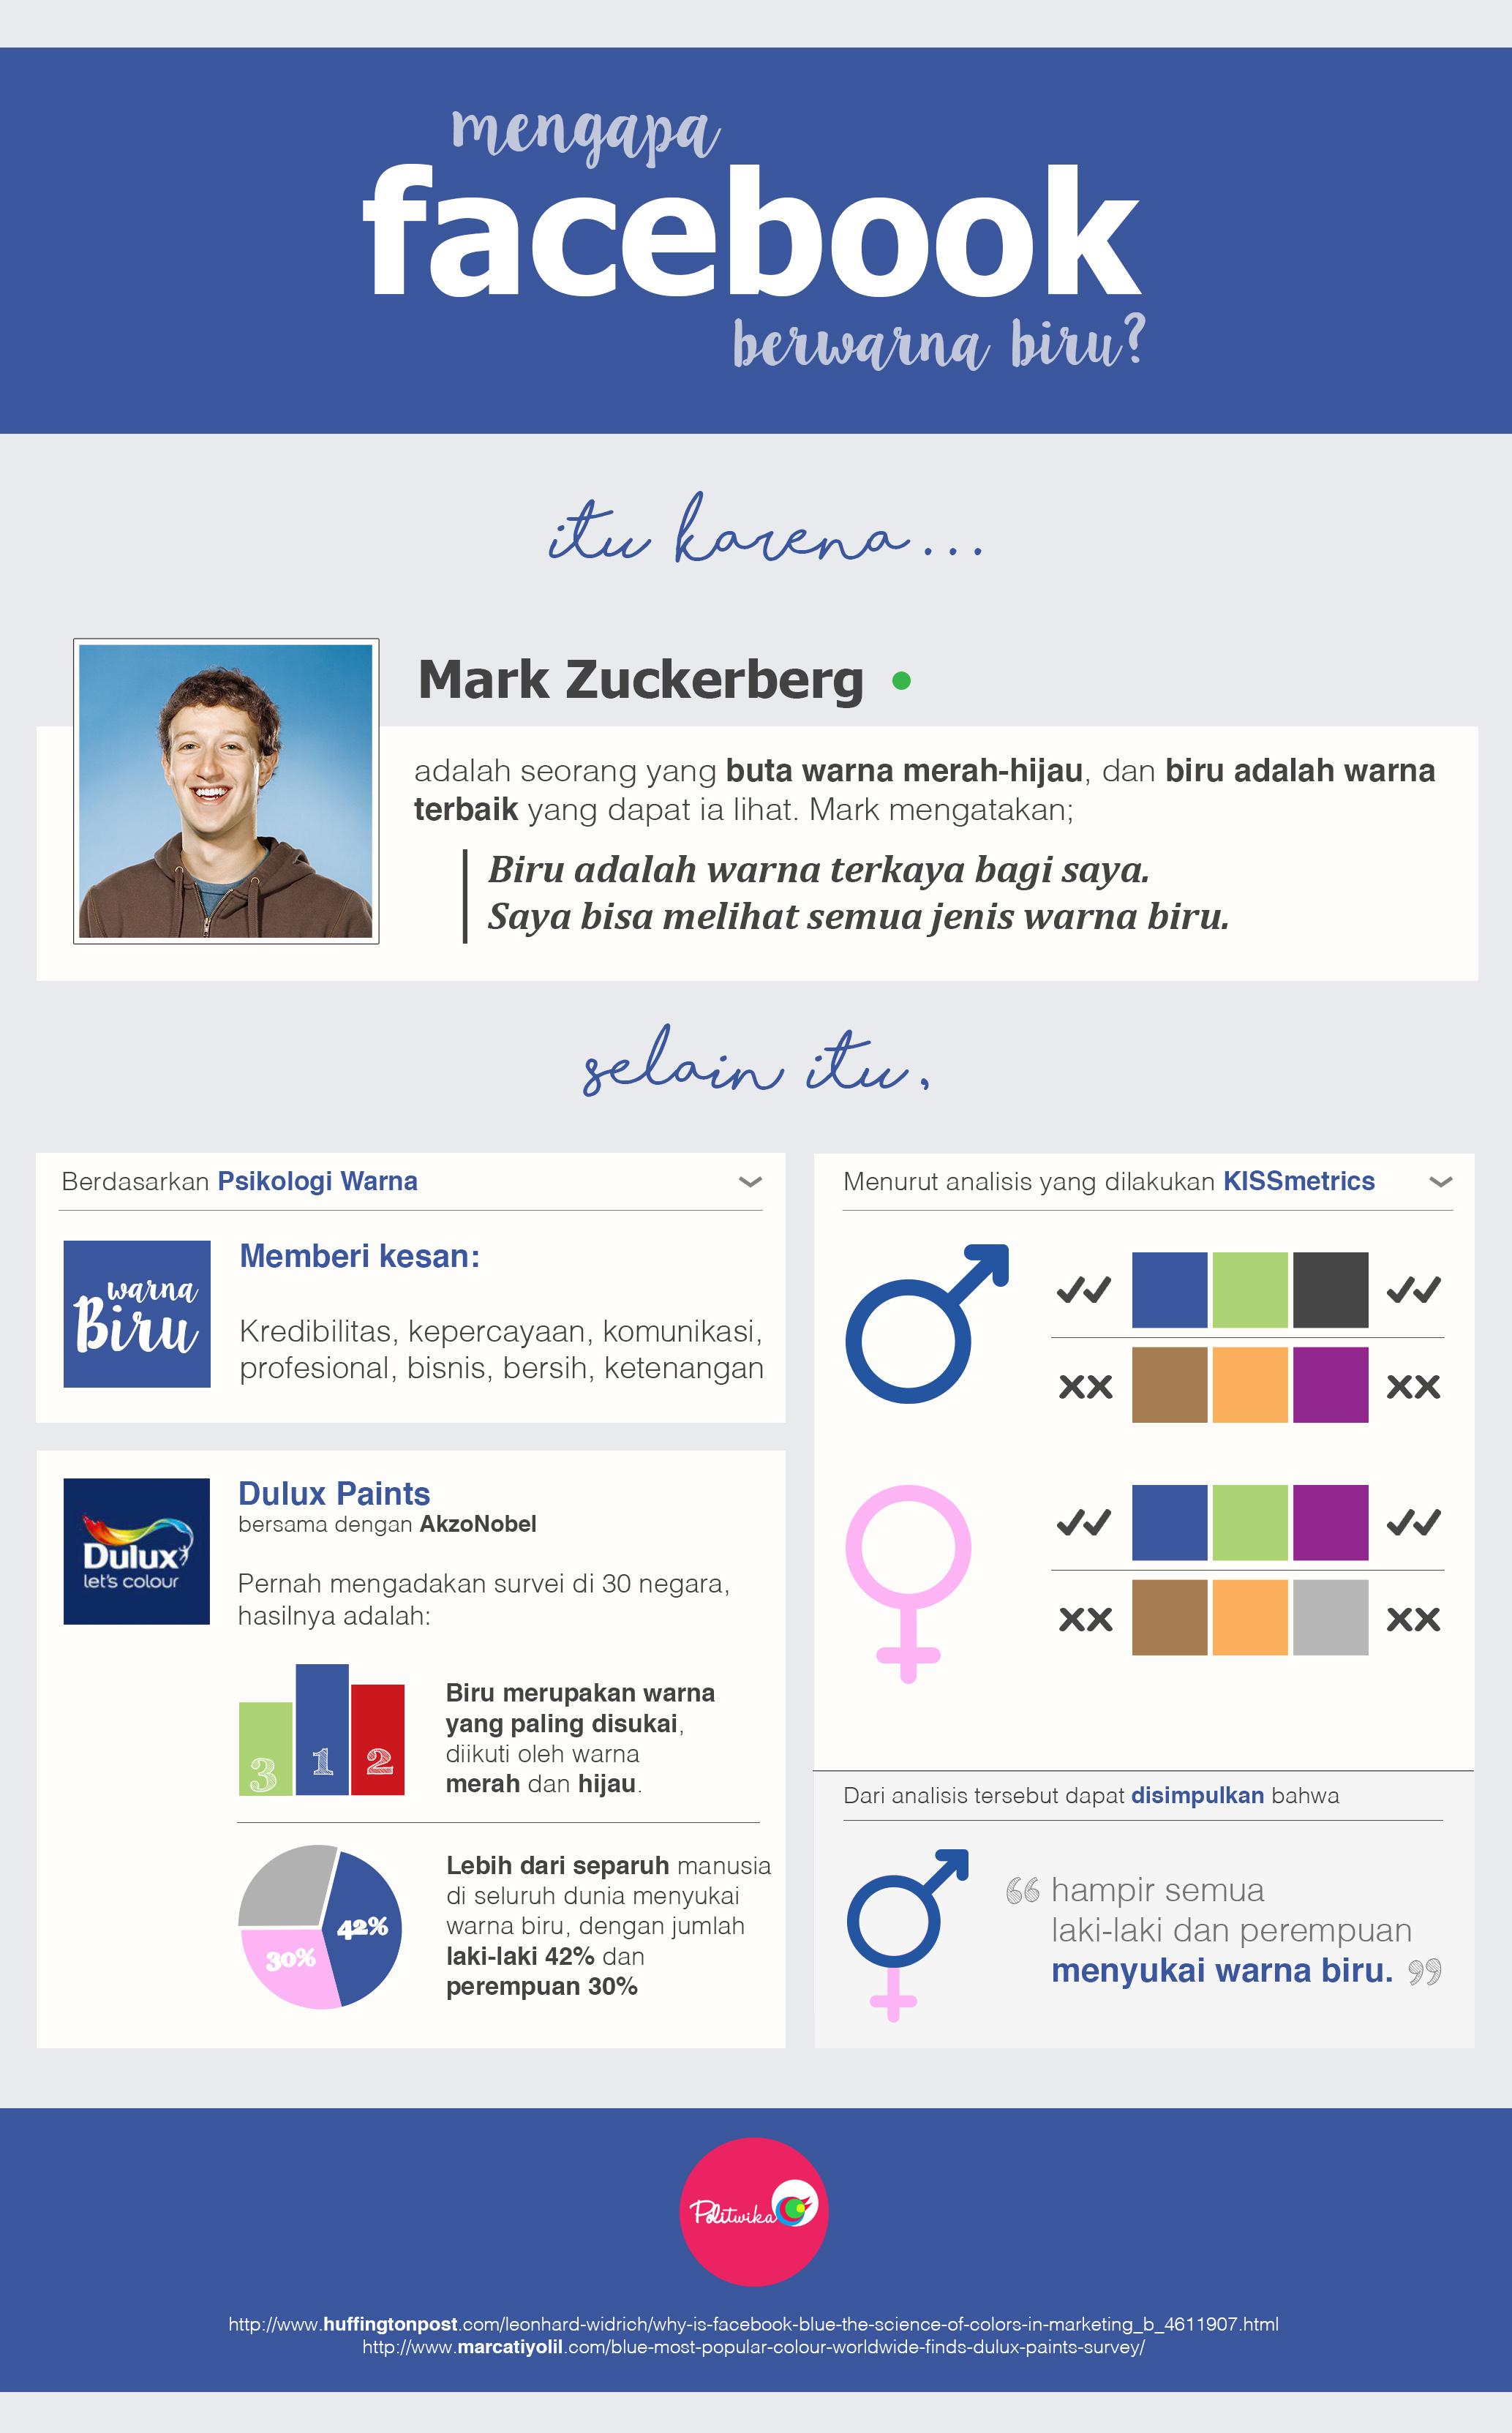 politwika_mengapa facebook berwarna biru?